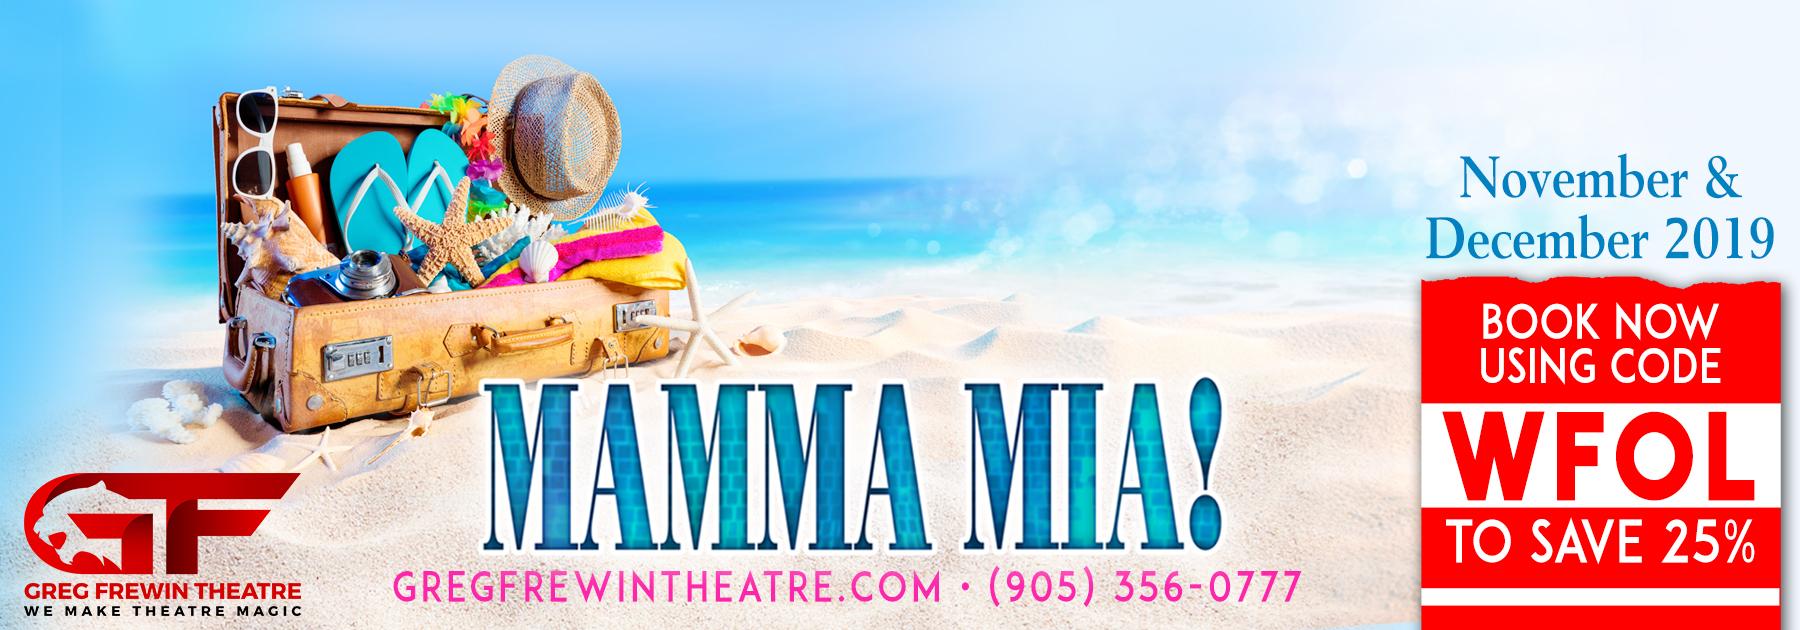 Mamma Mia Header Image